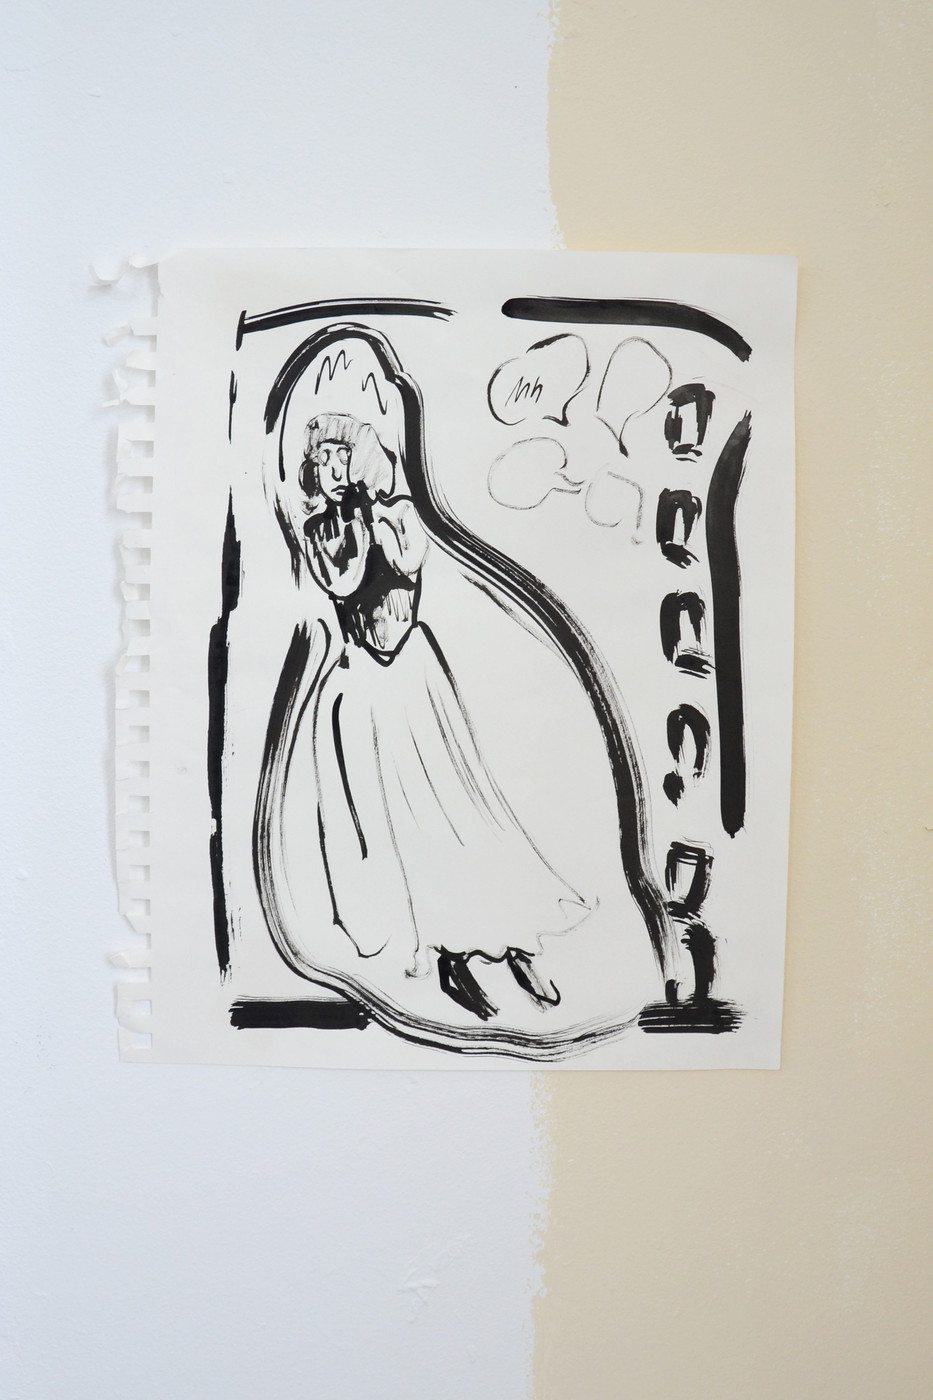 11 charlott weise, untitled, 2016